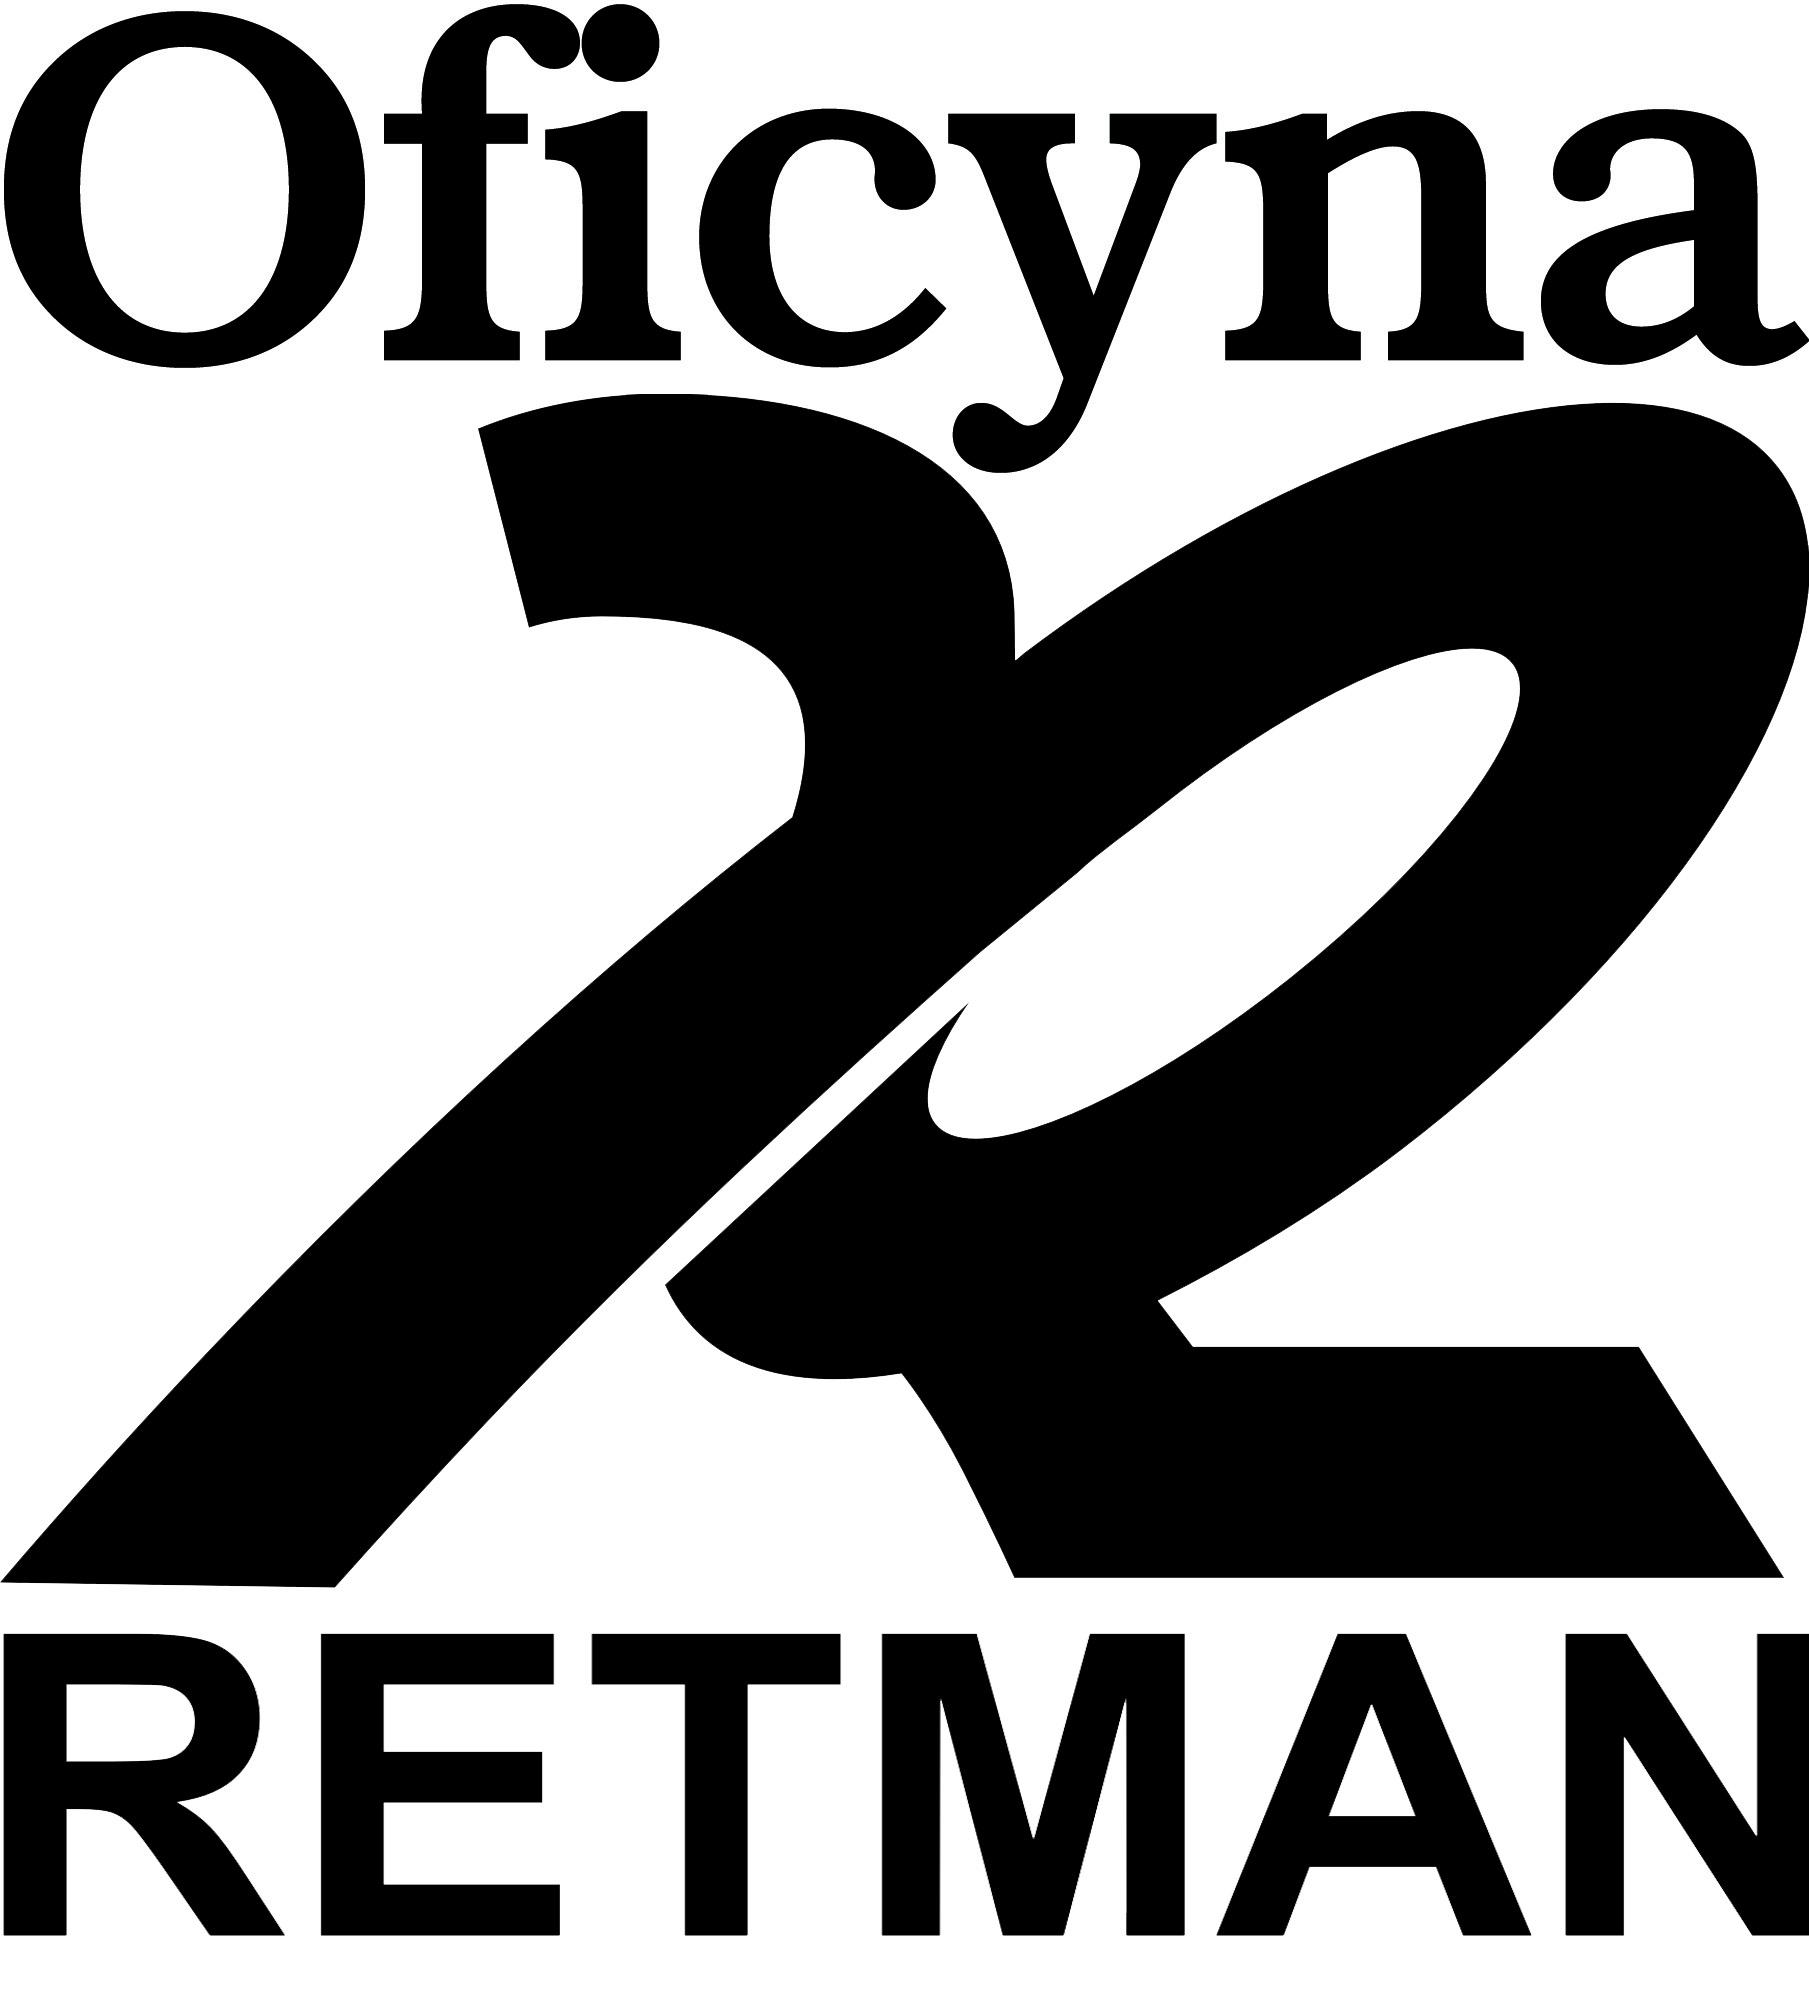 http://m.wmwm.pl/2016/11/orig/logo-oficyny-retman-5508.jpg